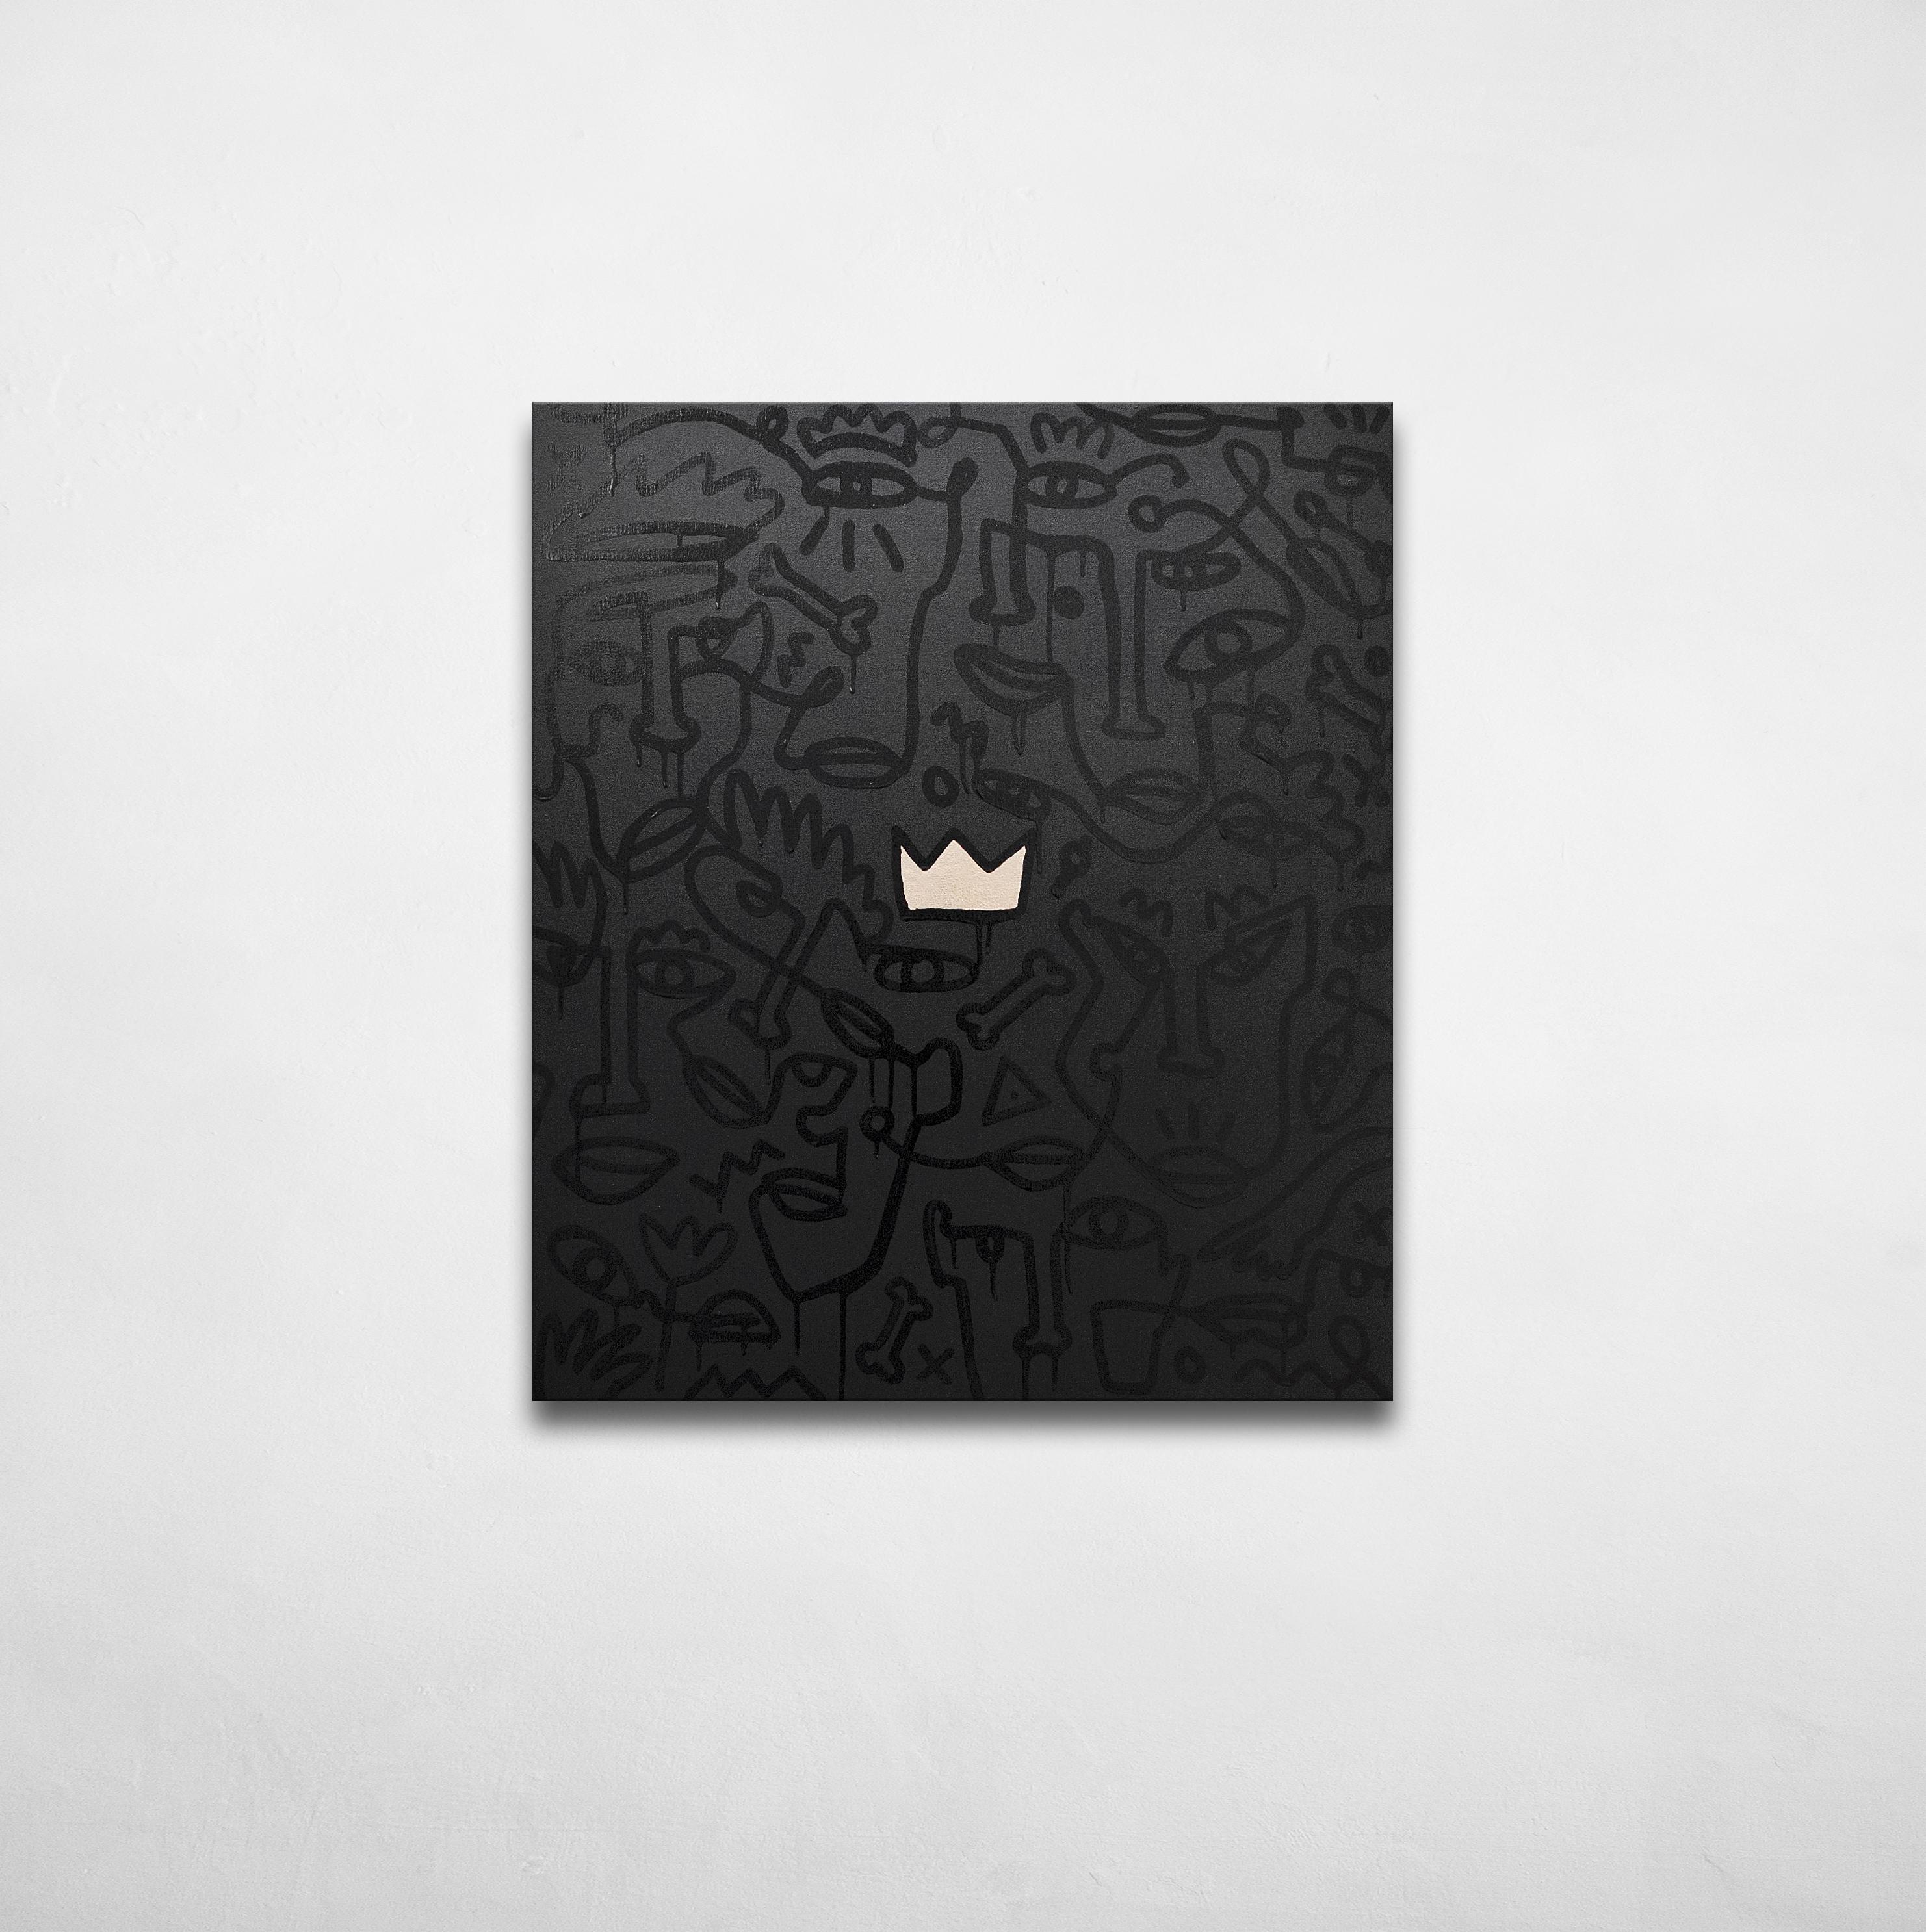 Black Velvet Future - contemporary Ukrainian art - monoline faces on a black with crown in the center - black on black picture